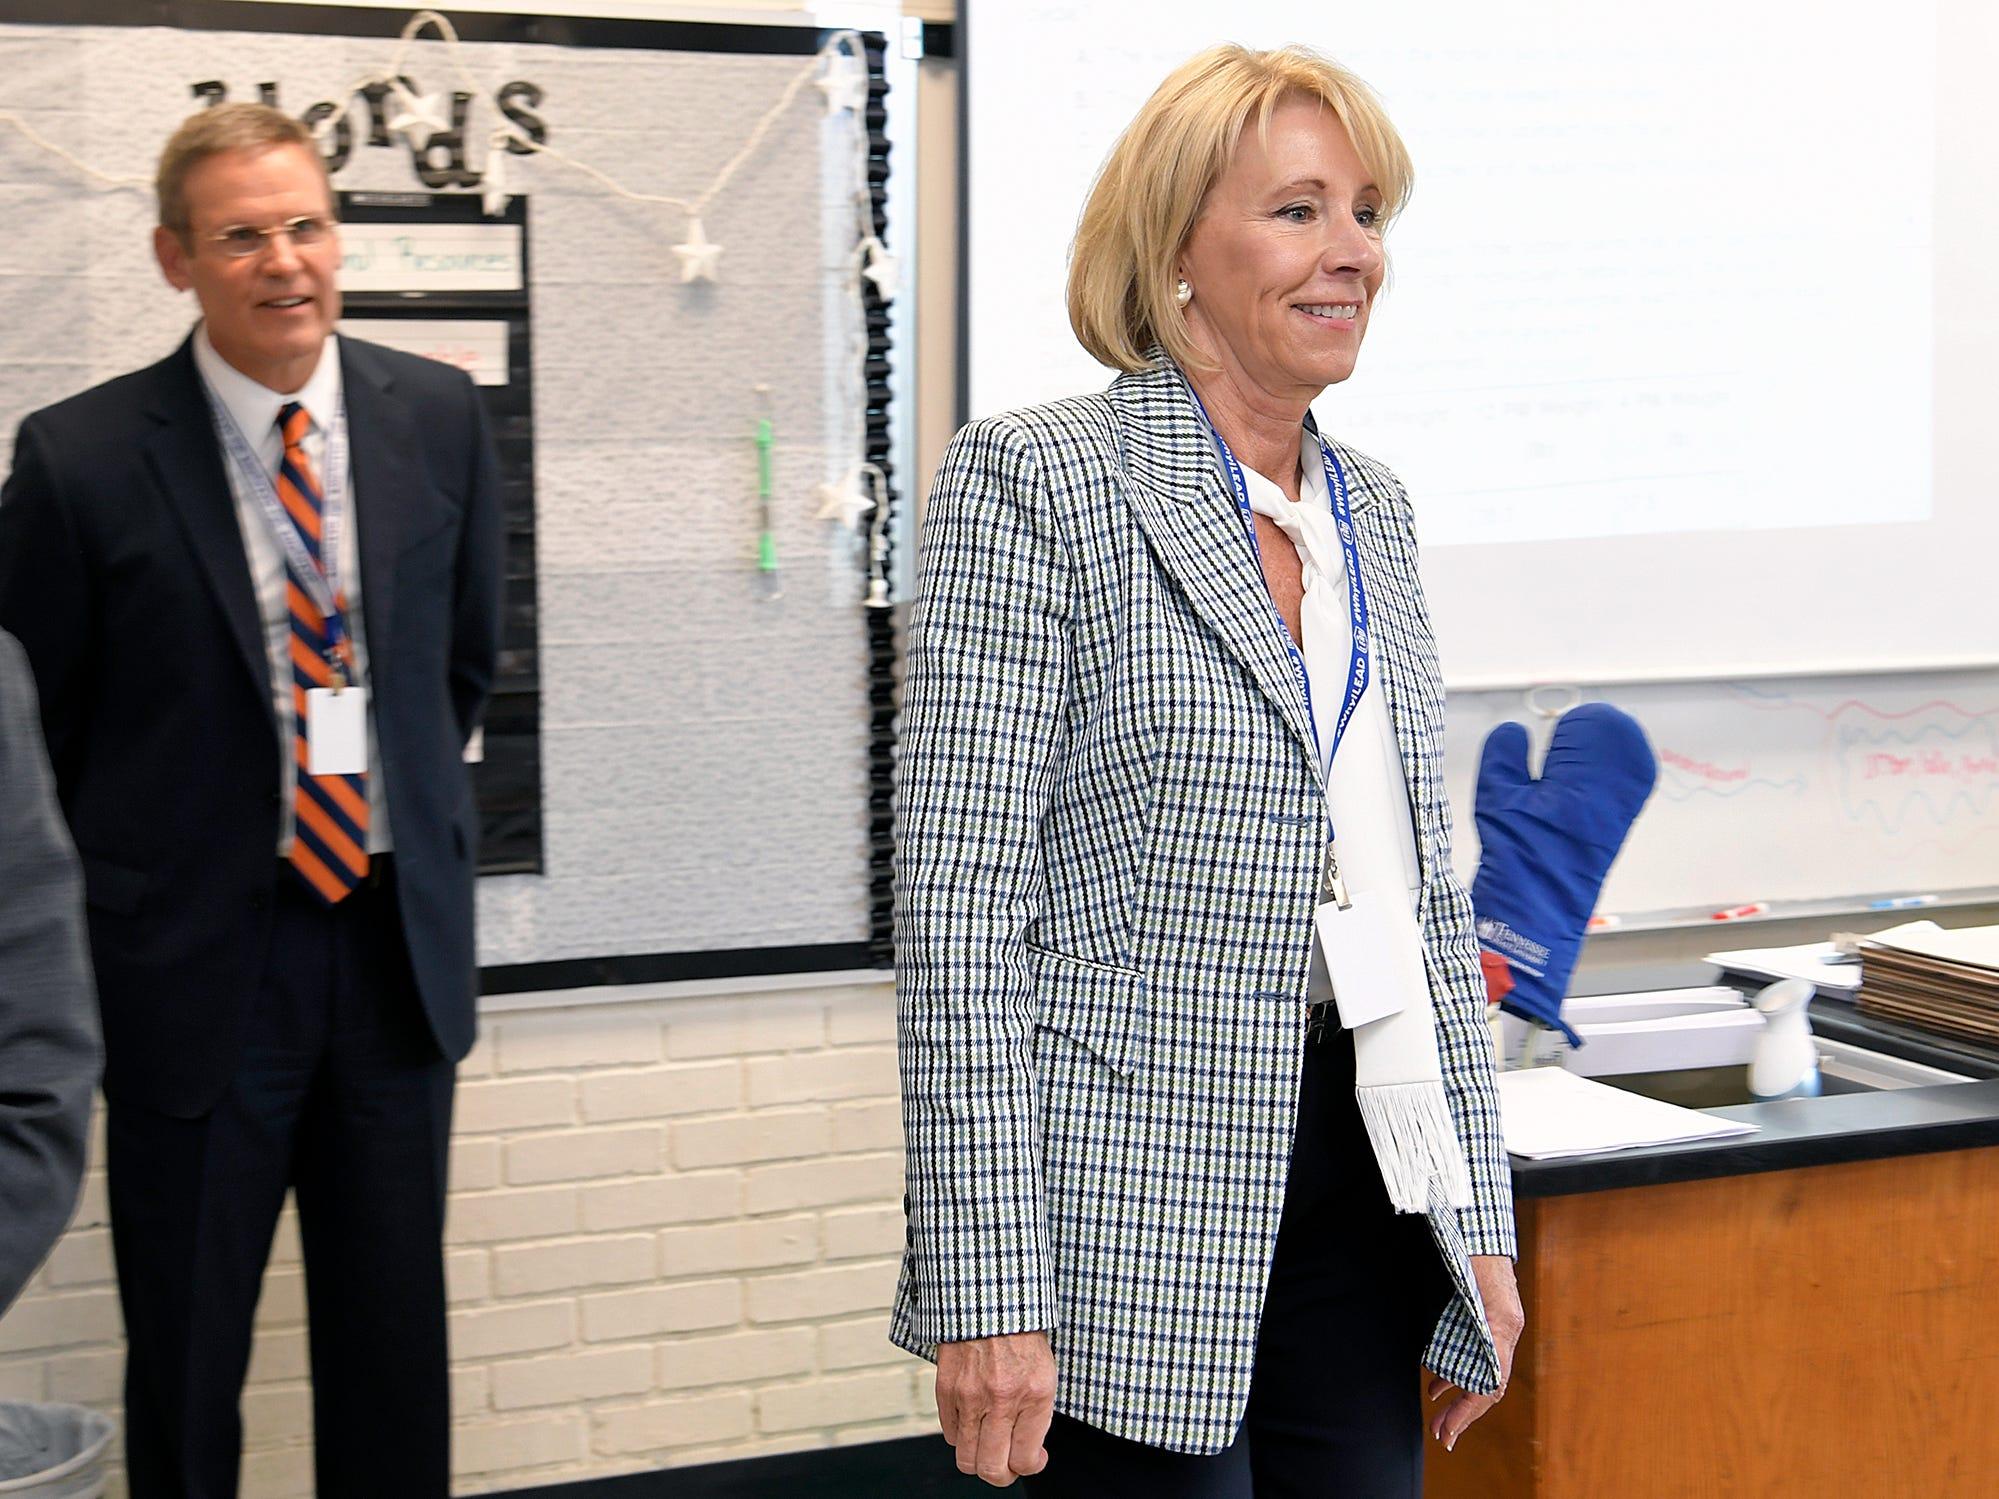 Education Secretary Betsy DeVos and Gov. Bill Lee tour LEAD Cameron Middle School Nashville on Monday, April 1, 2019.